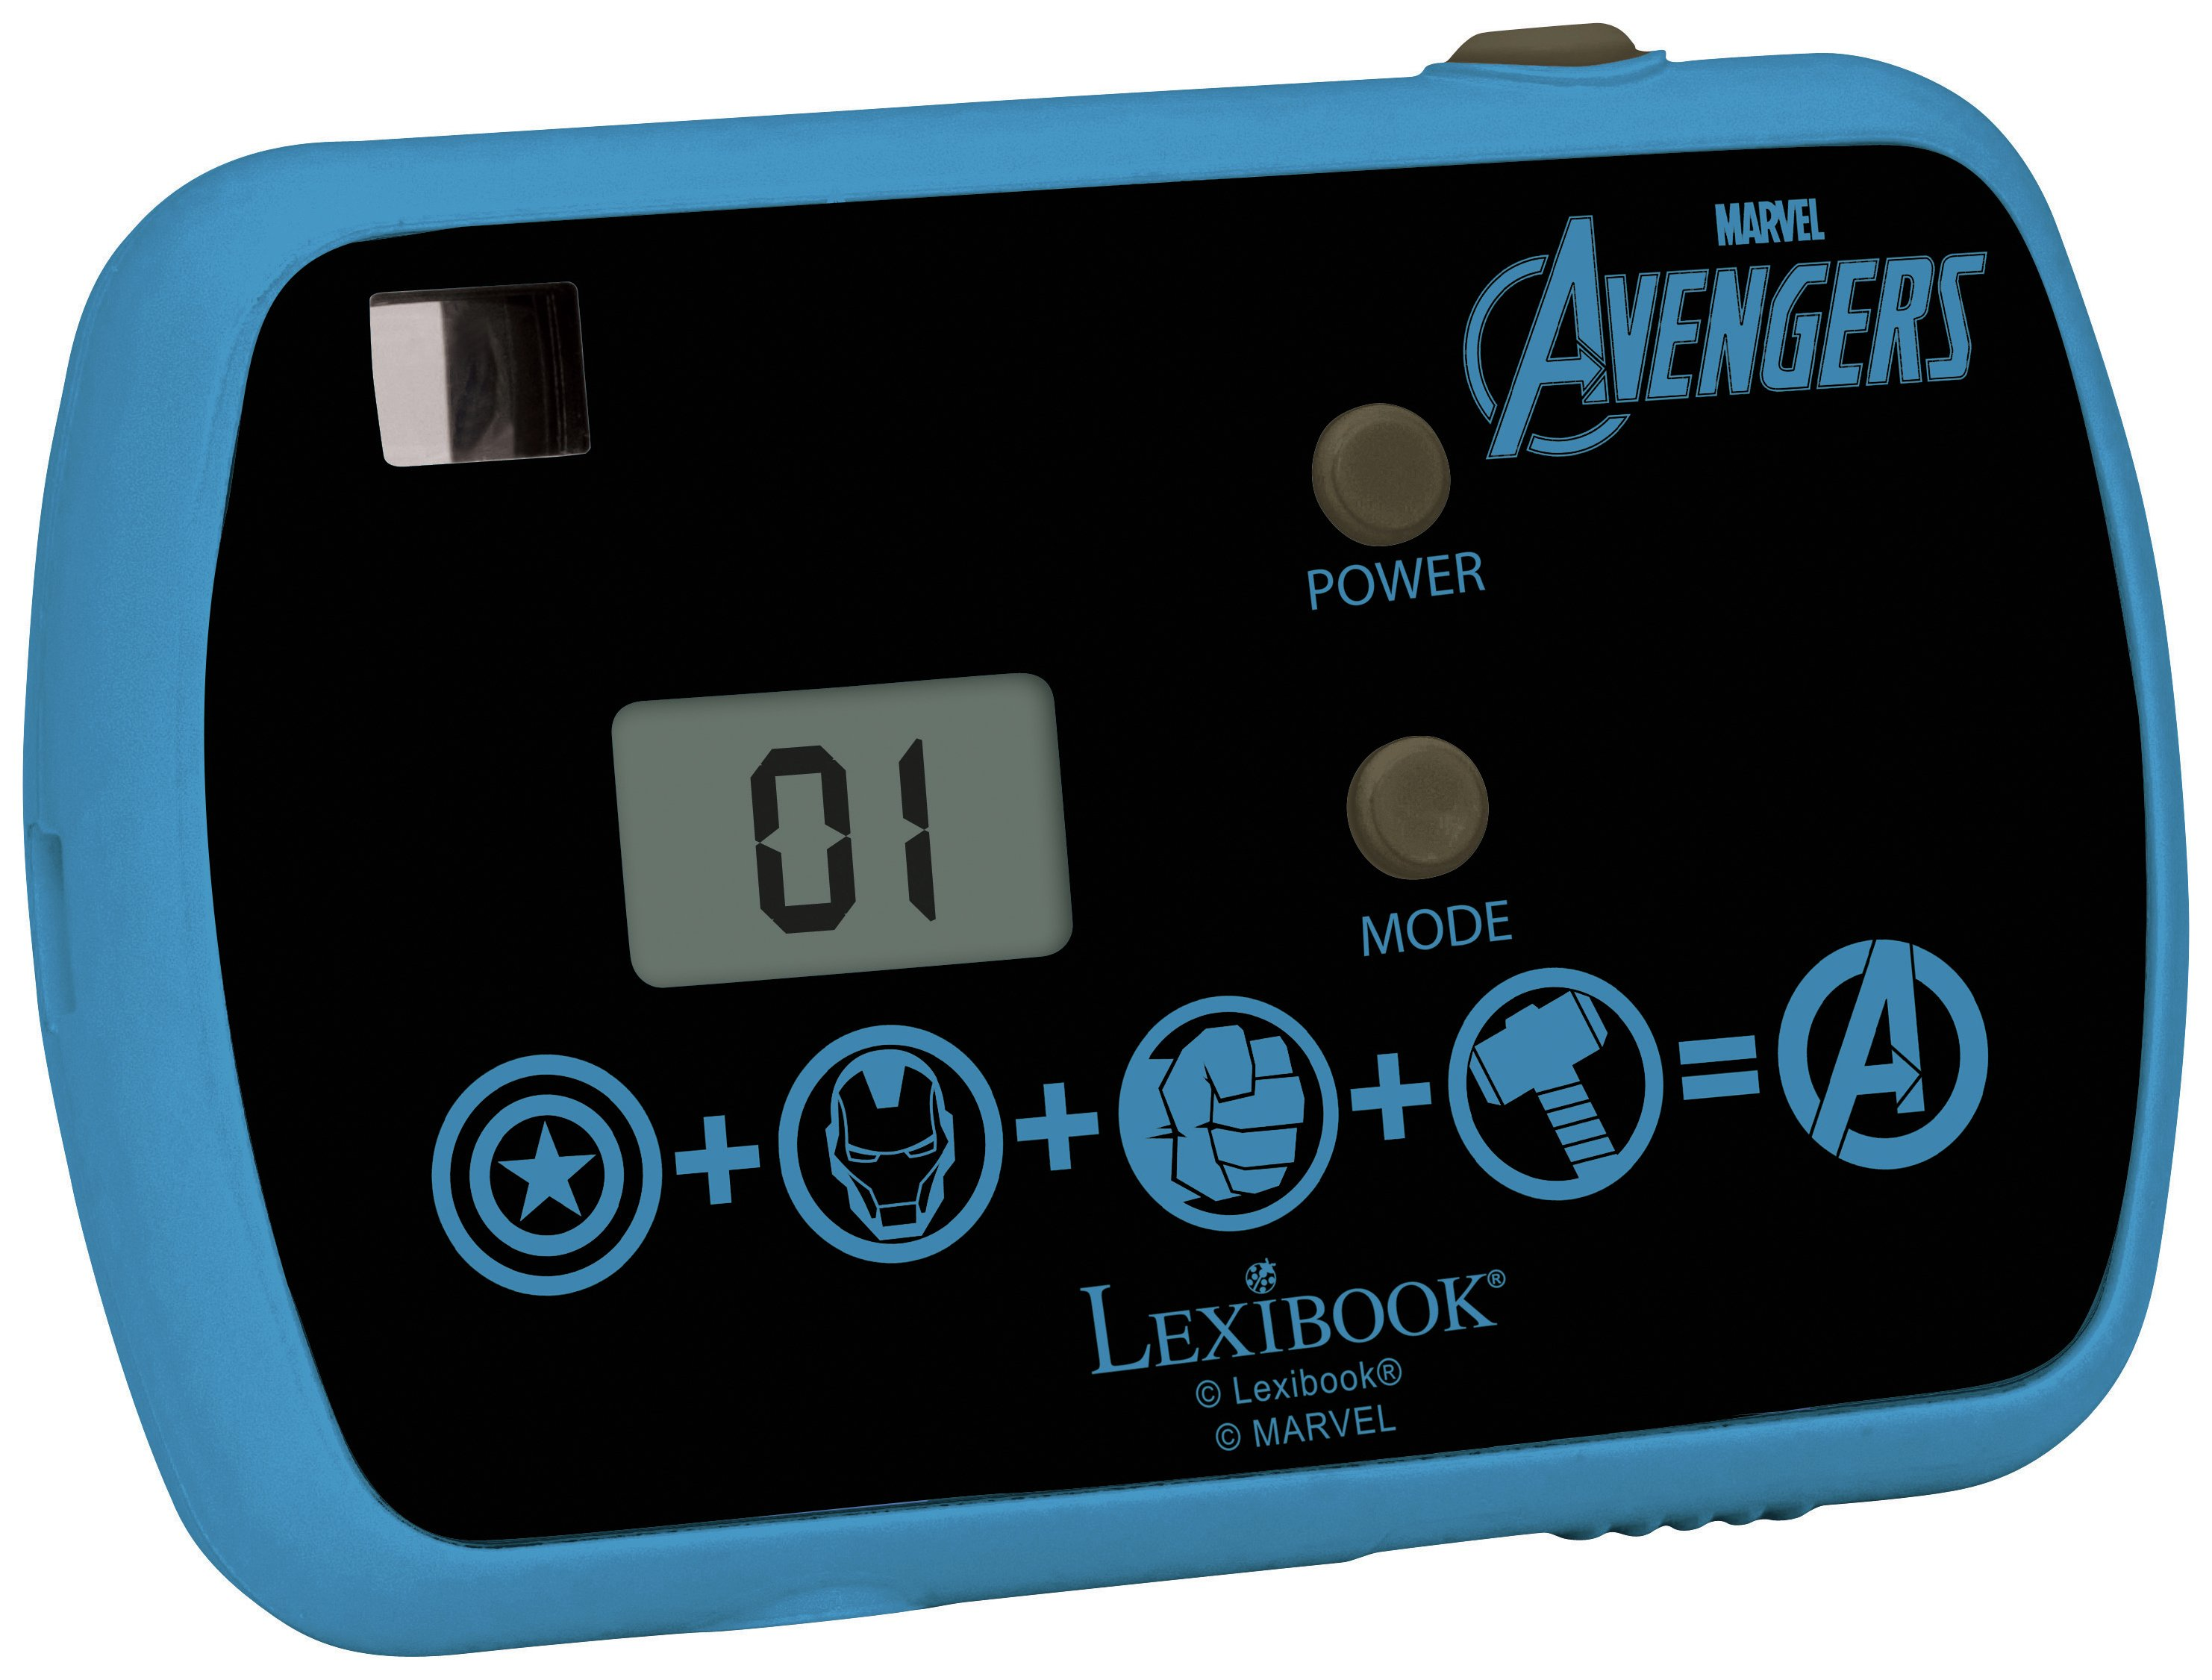 Avengers 1.3 MP Digital Camera.